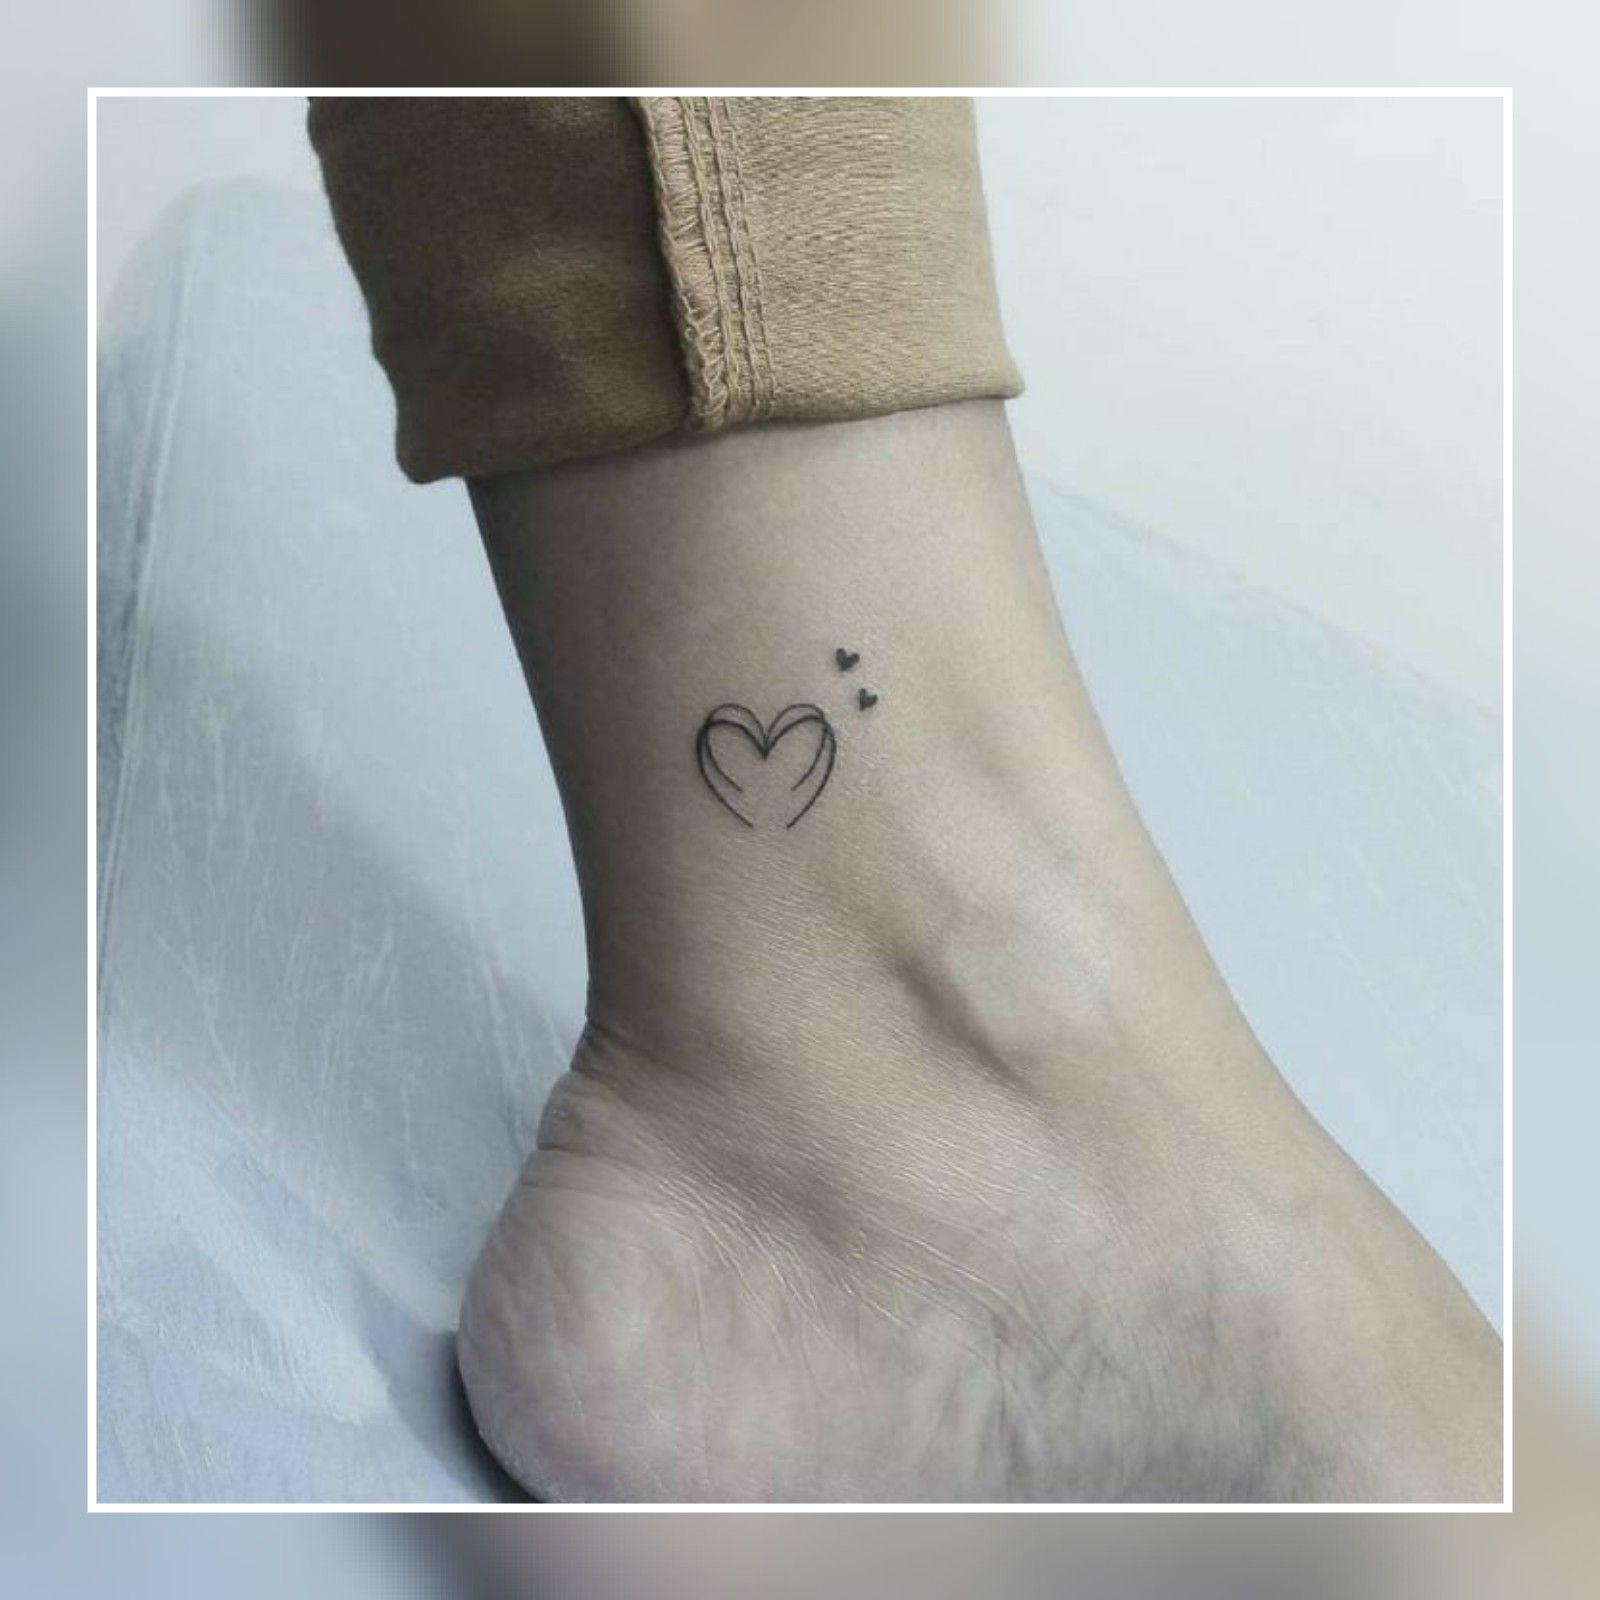 Cute Small Tattoo Designs For Girls Female Women (206)